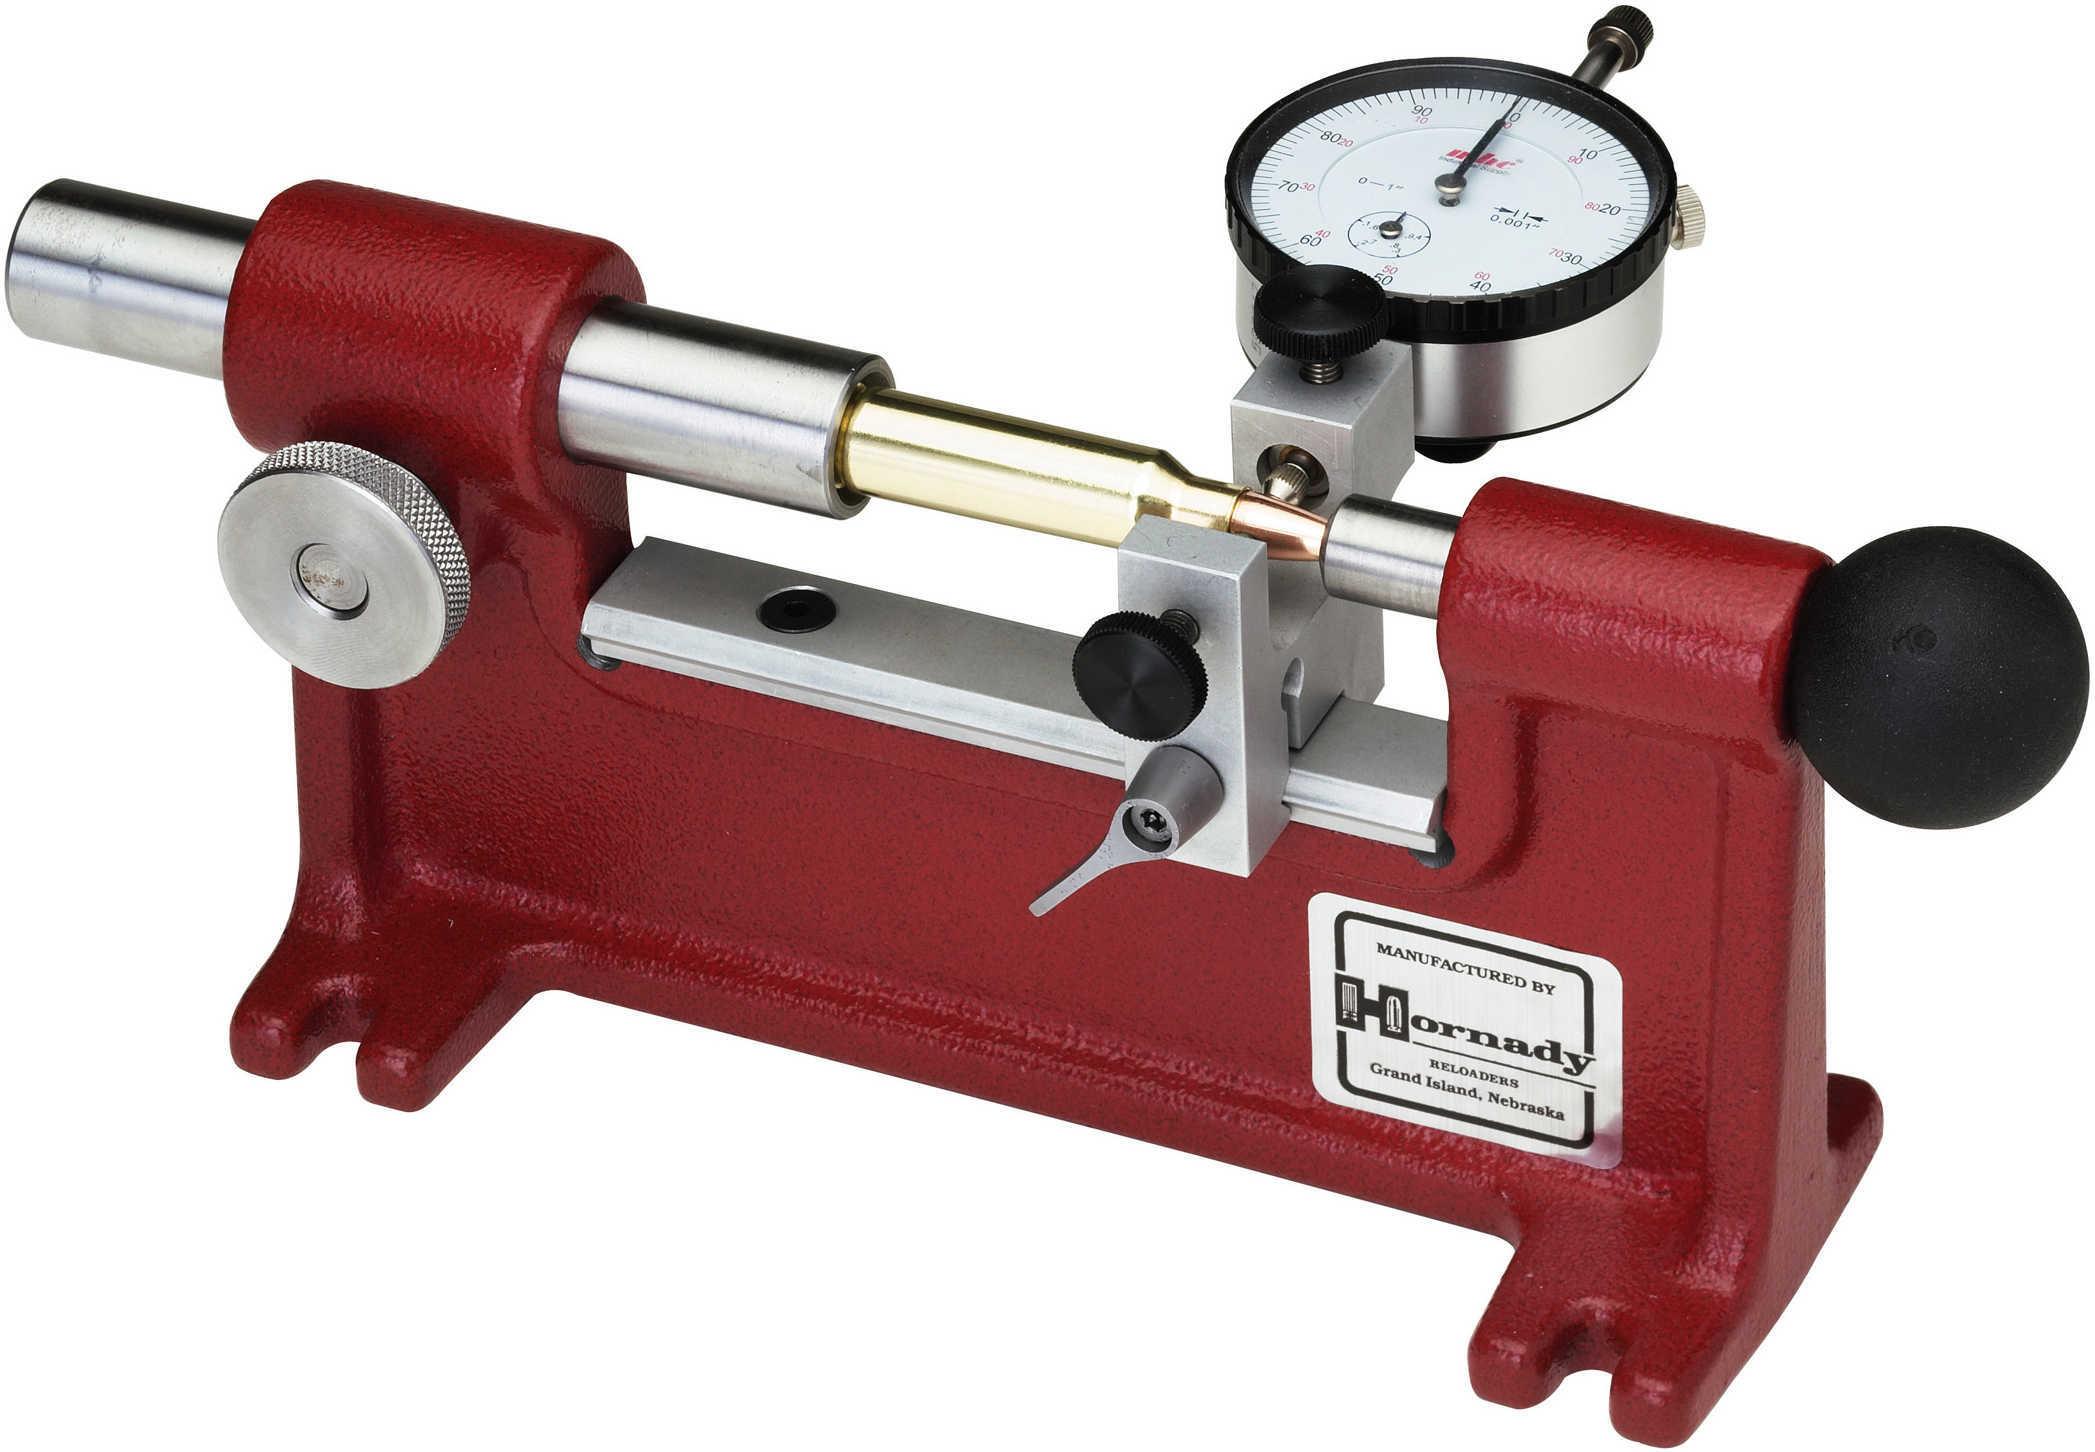 Hornady Lock-N-Load Ammunition Concentricity Gauge Md: 050076